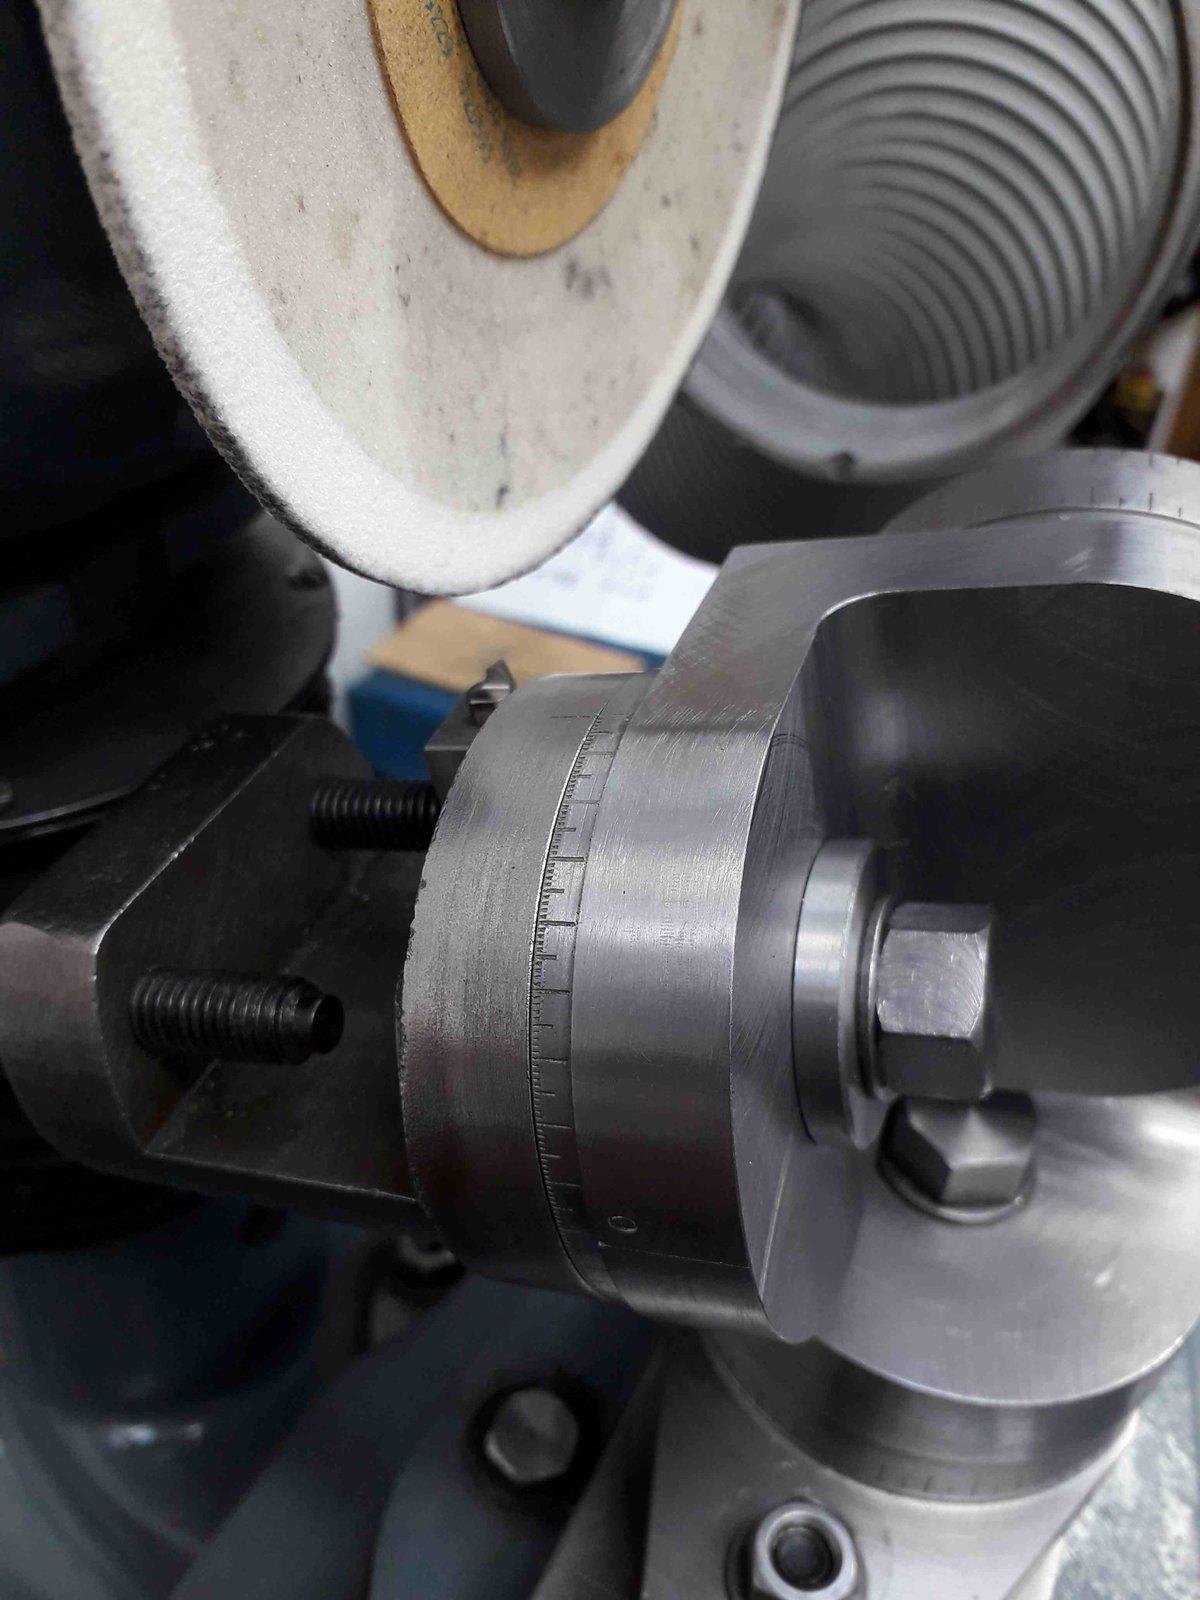 ACME toolbit grinding.jpg